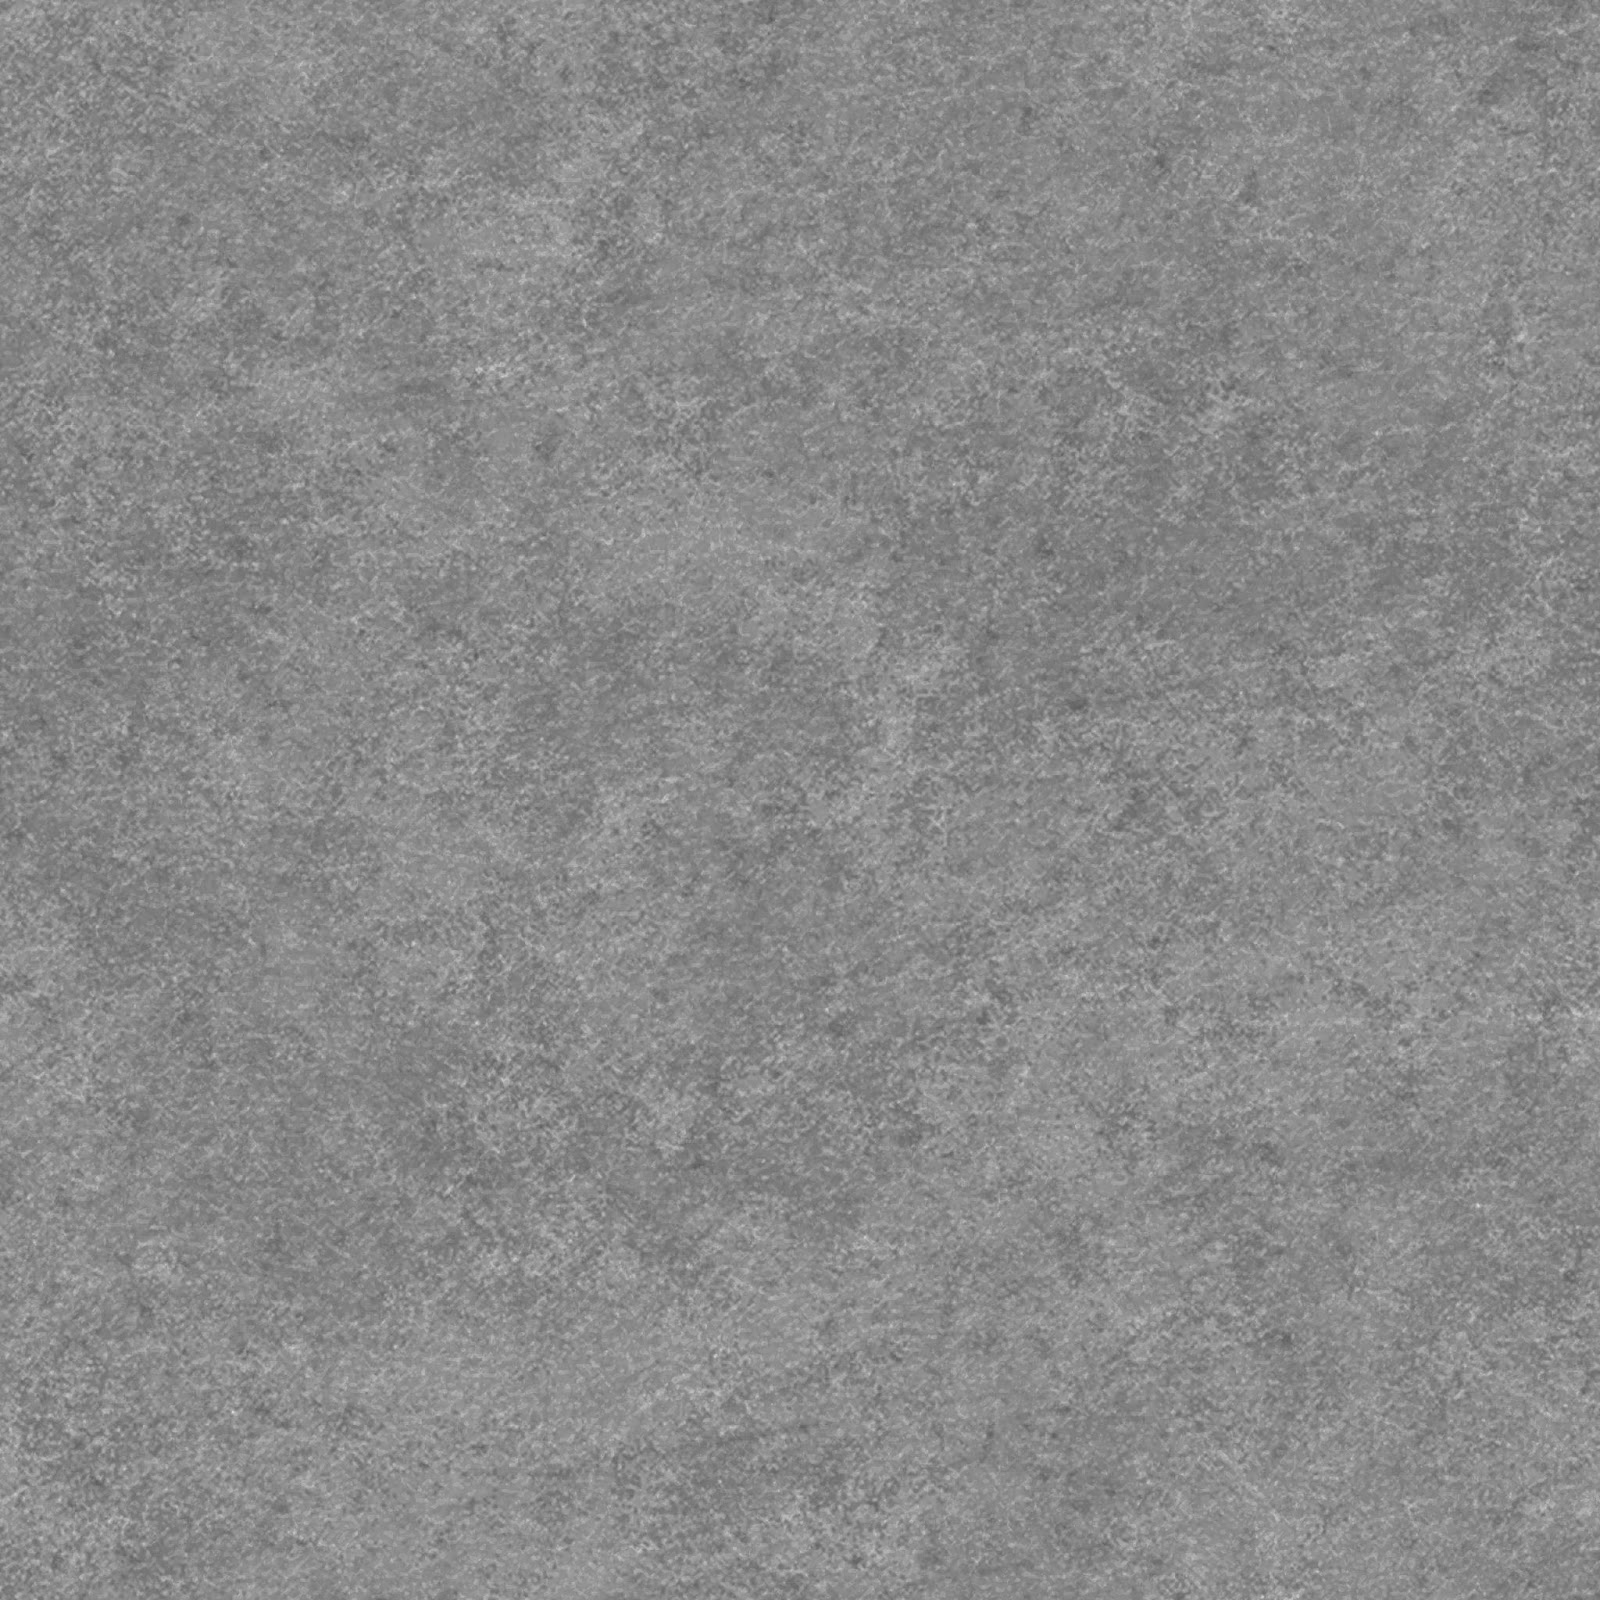 High Resolution Seamless Textures Tileable Metal Texture 16